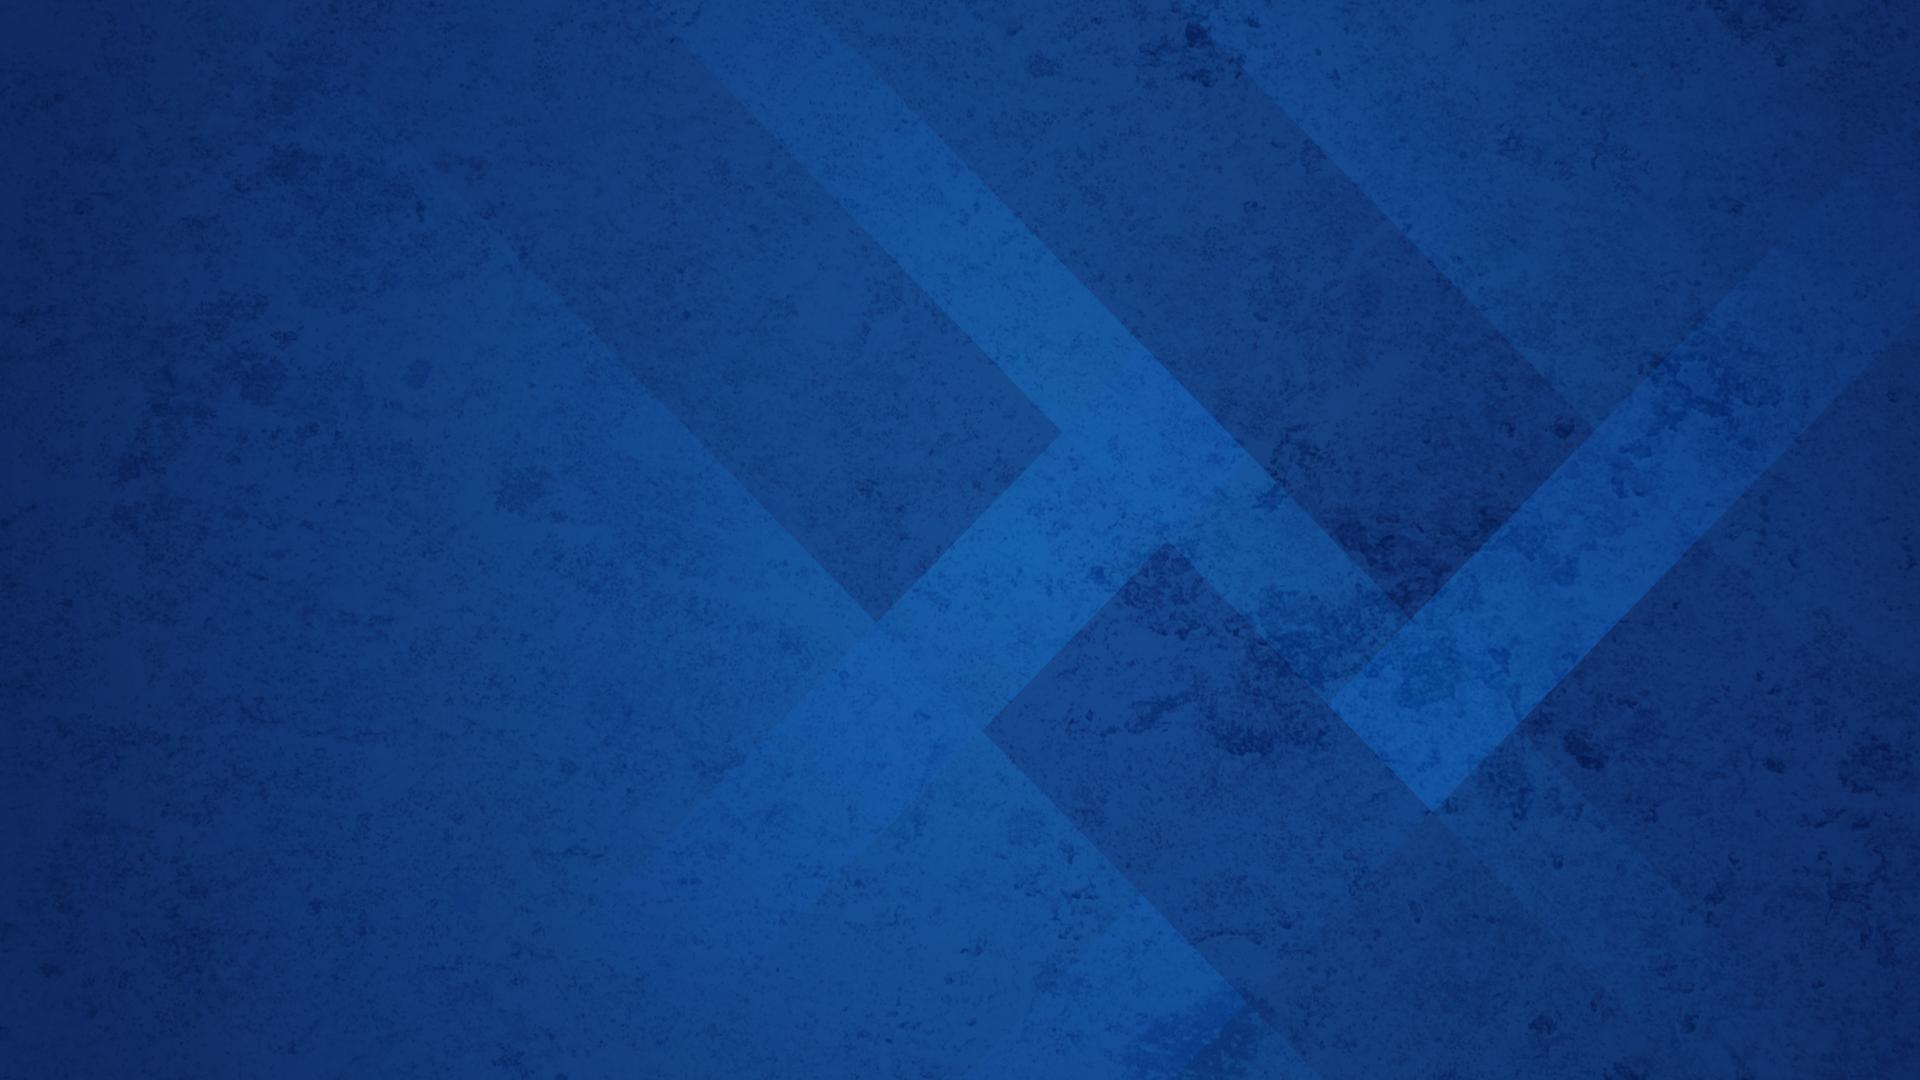 18 Wallpaper Background Keren Bernuansa Biru Full Hd: FedoraProject